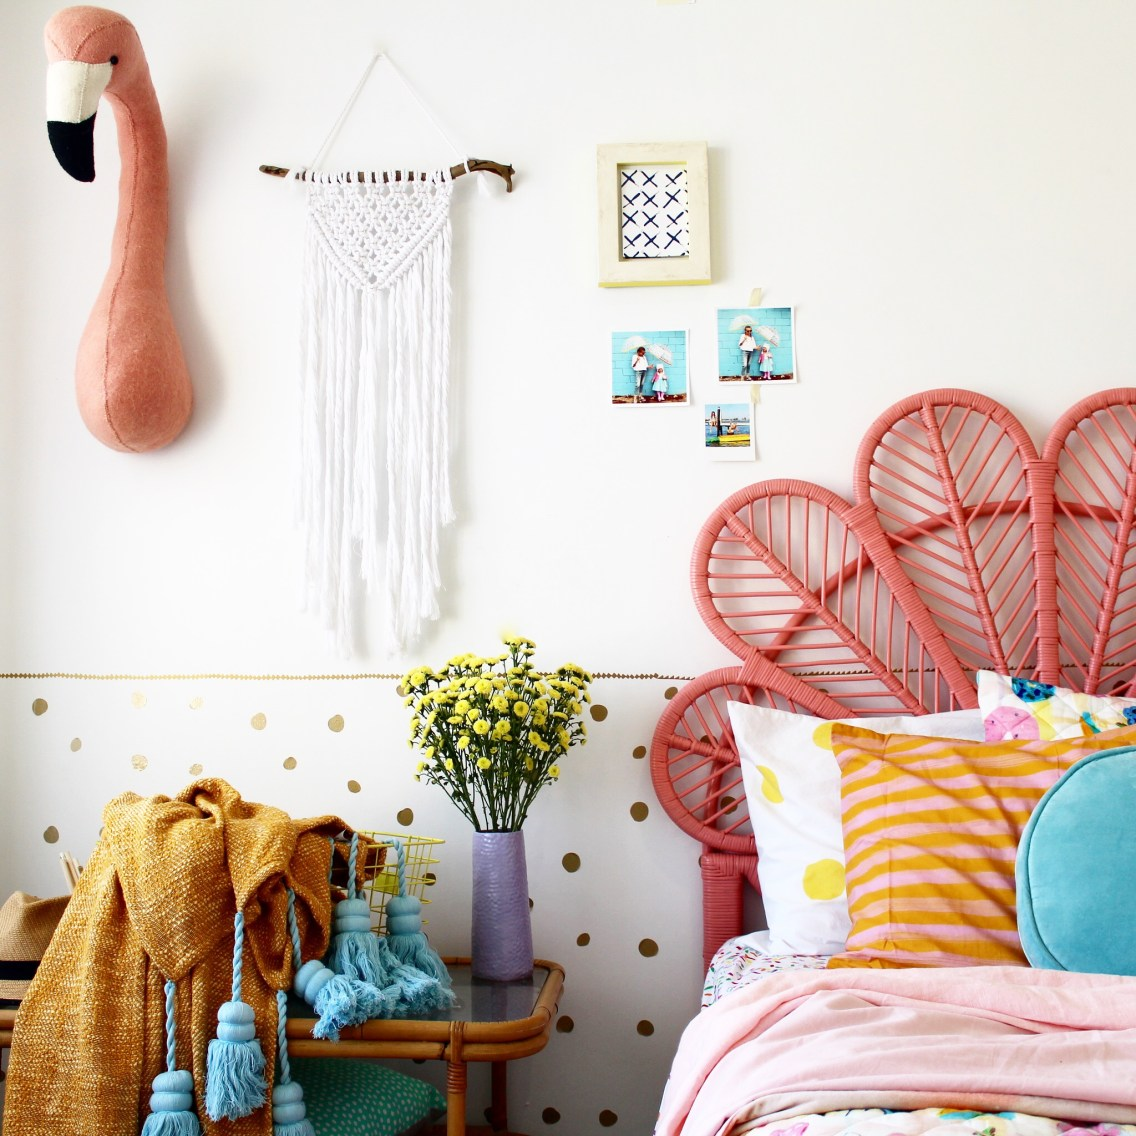 Girls bedroom ideas |kids bedding and decor | modern boho bedroom ideas more on the blog